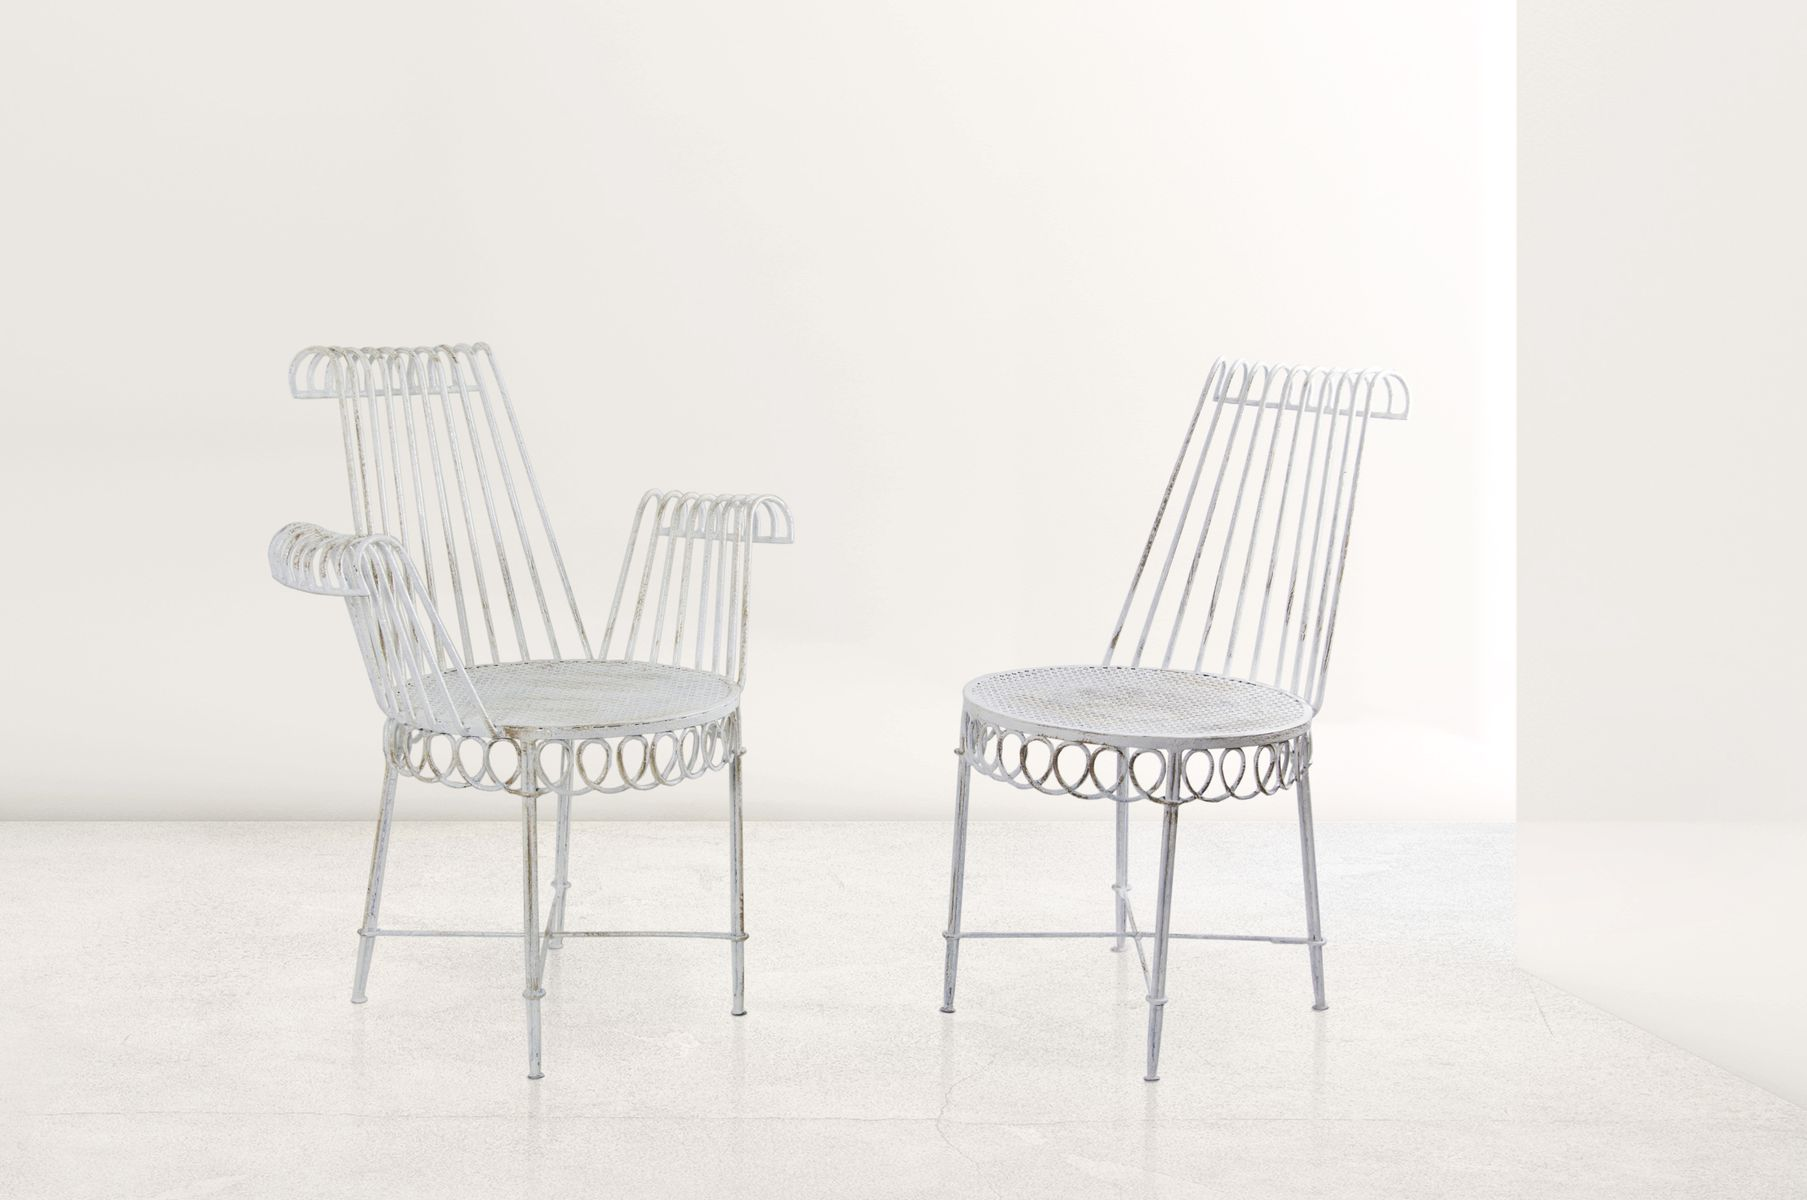 cap d 39 ail gartenst hle von mathieu mategot 1950er 4er set bei pamono kaufen. Black Bedroom Furniture Sets. Home Design Ideas